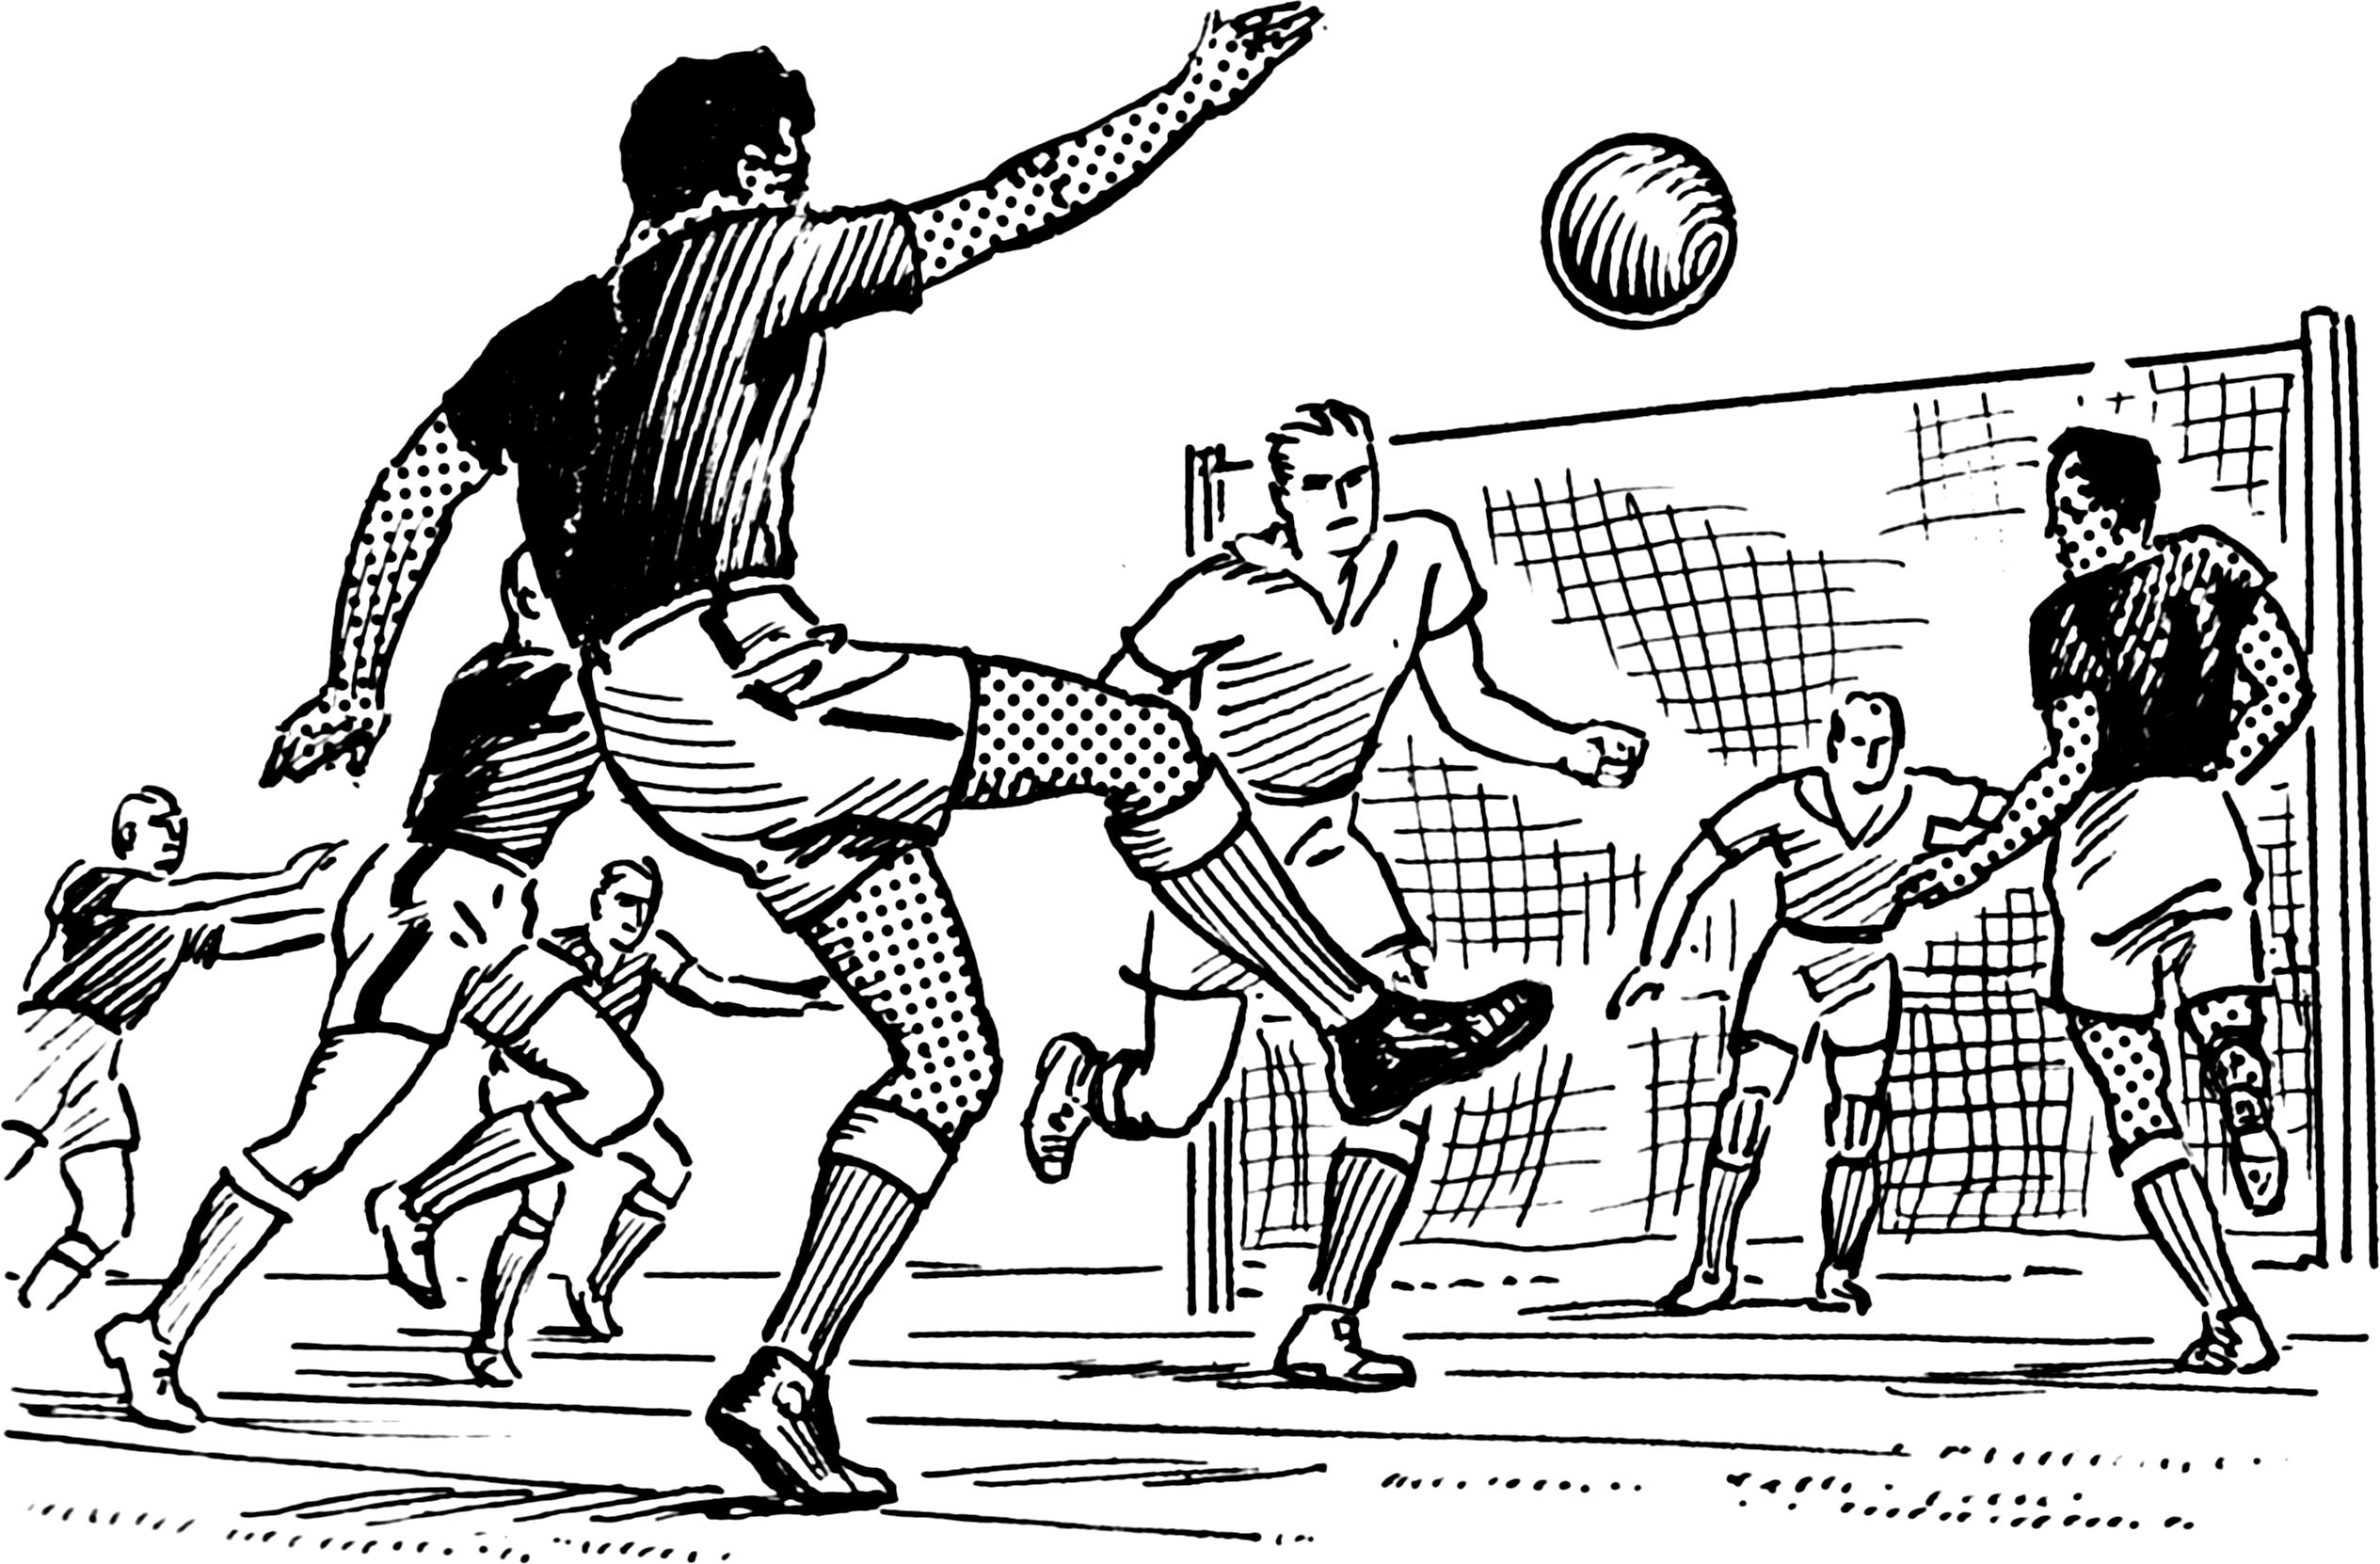 Football match drawings